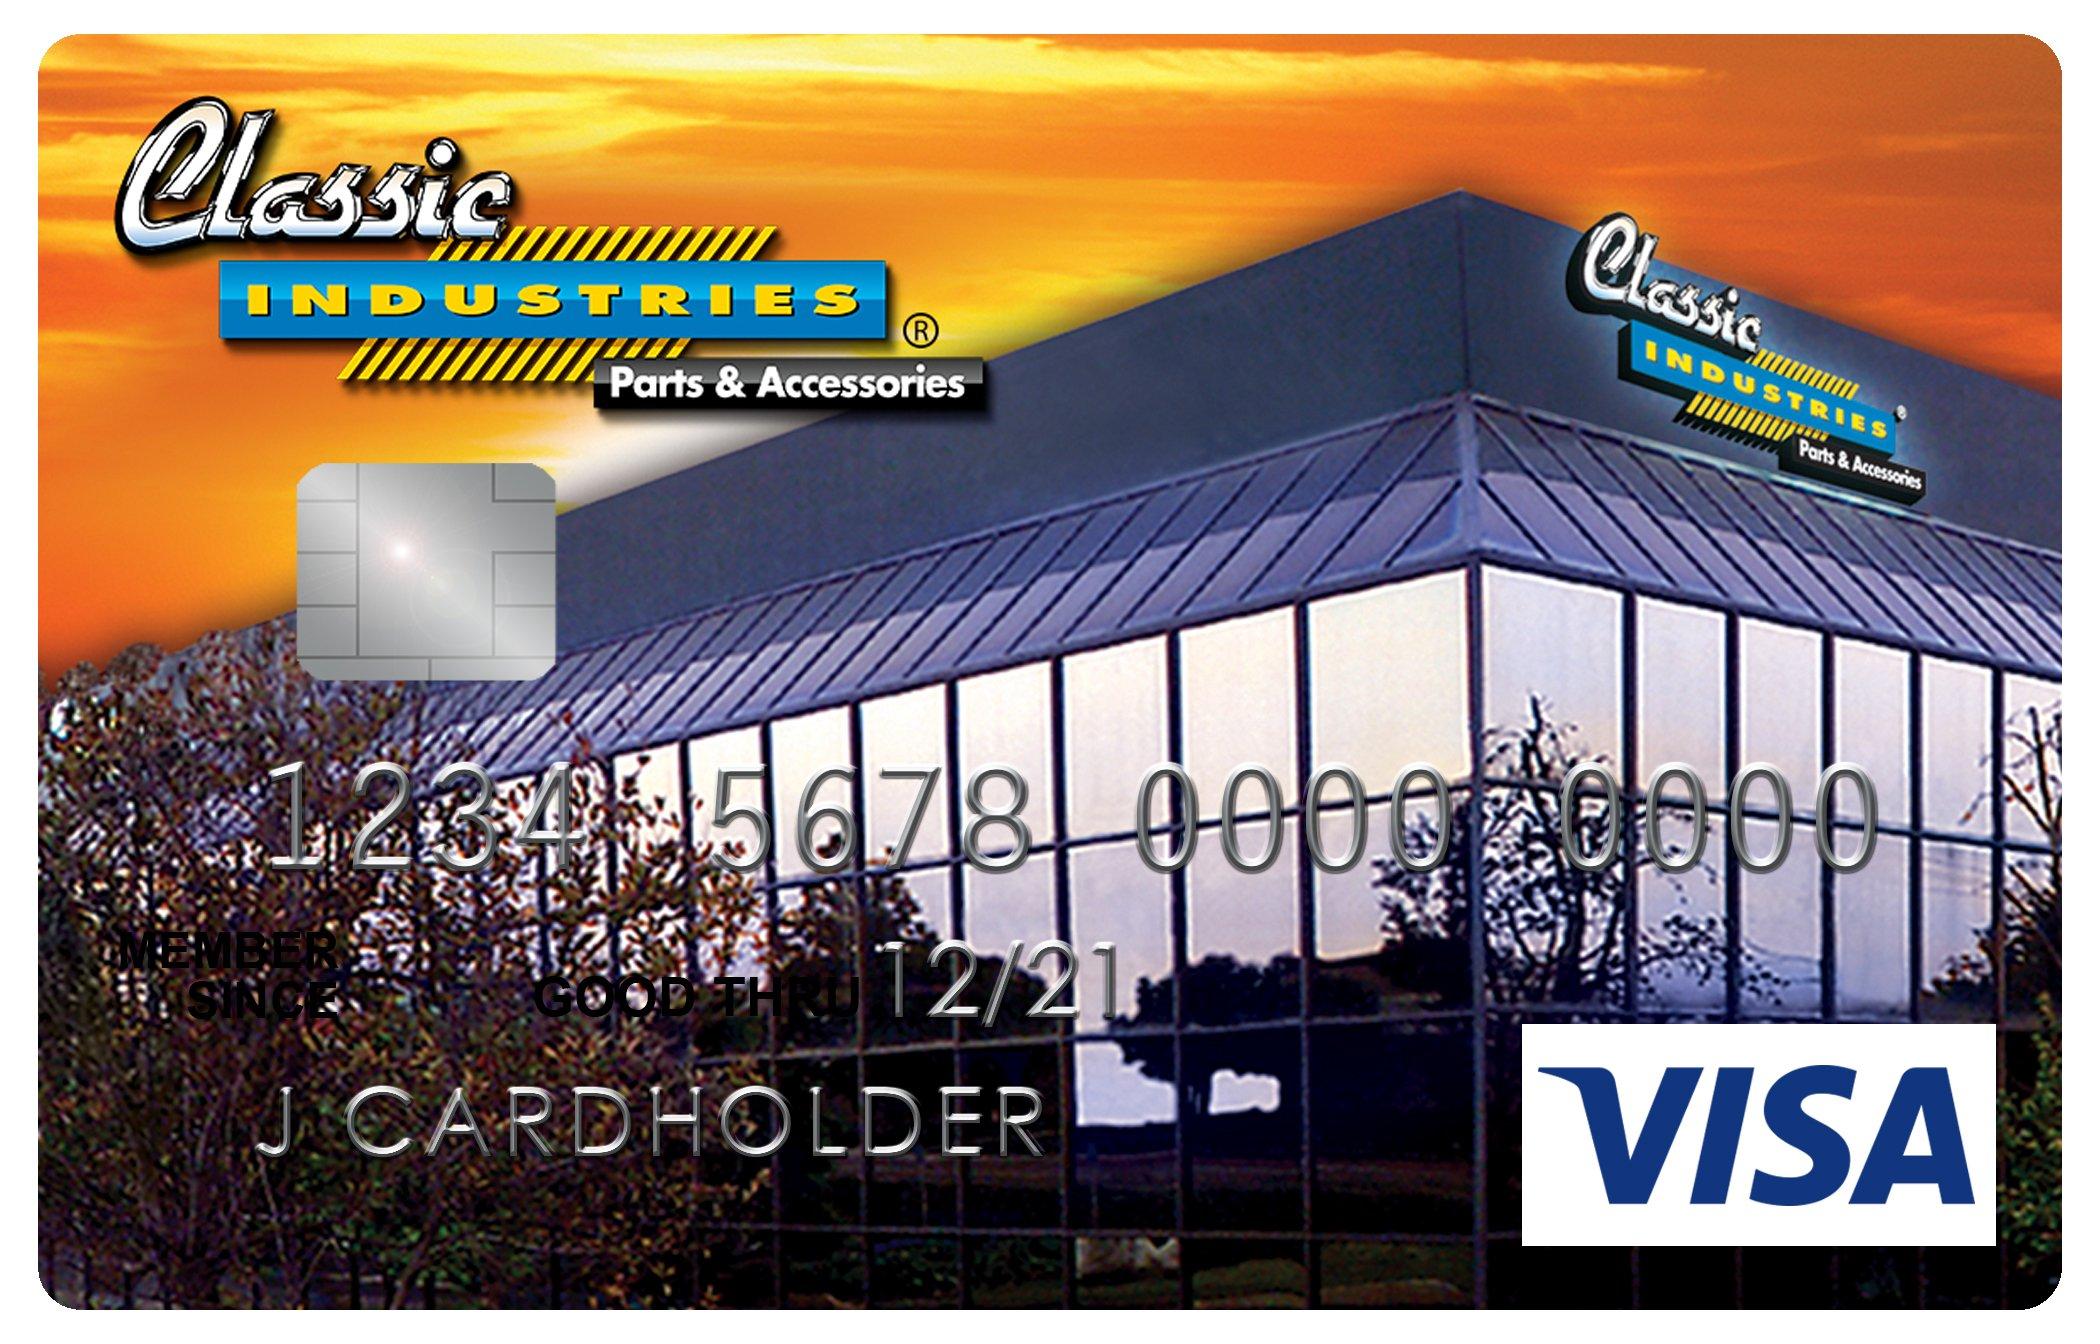 UMB-CardArt-ClassicIndustries-building-Visa-Final